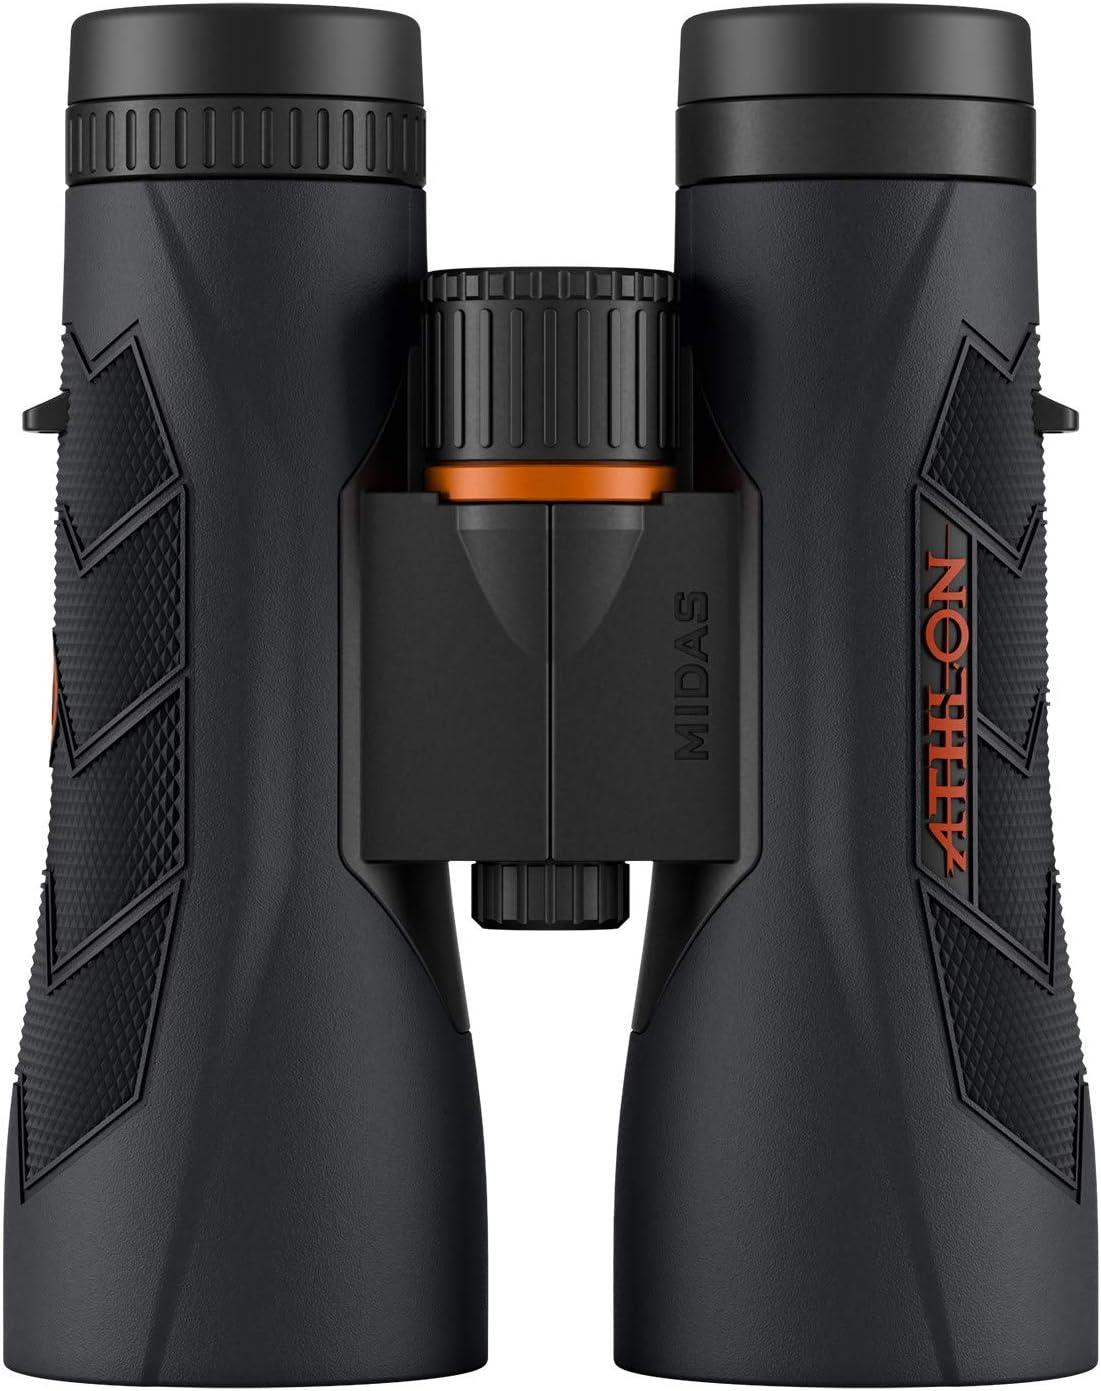 Image of a binocular pair in black with orange details on it. Lens facing downwards